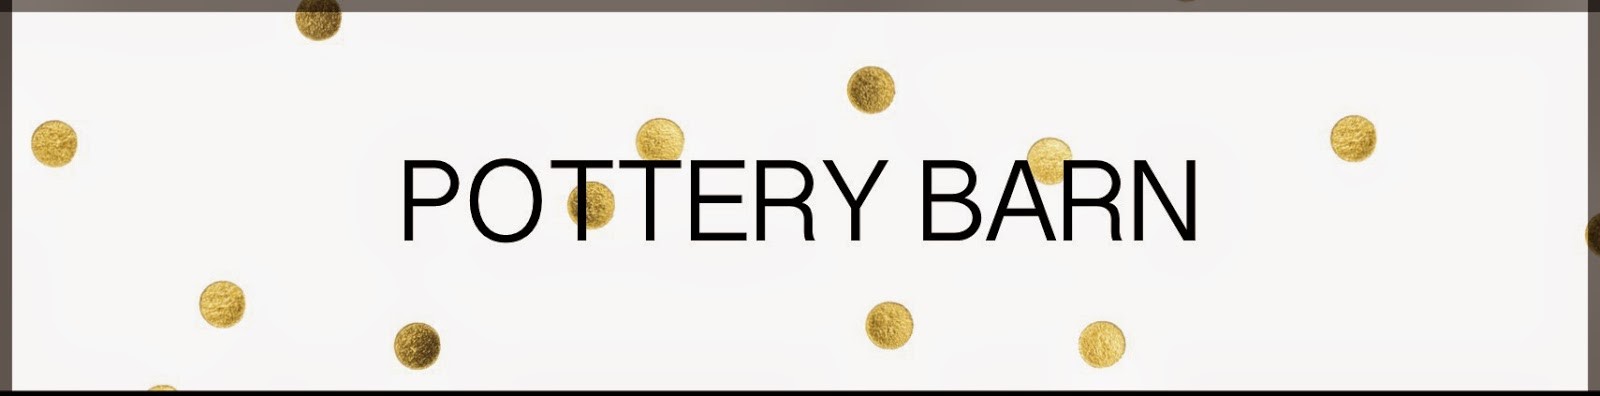 http://www.potterybarn.com/